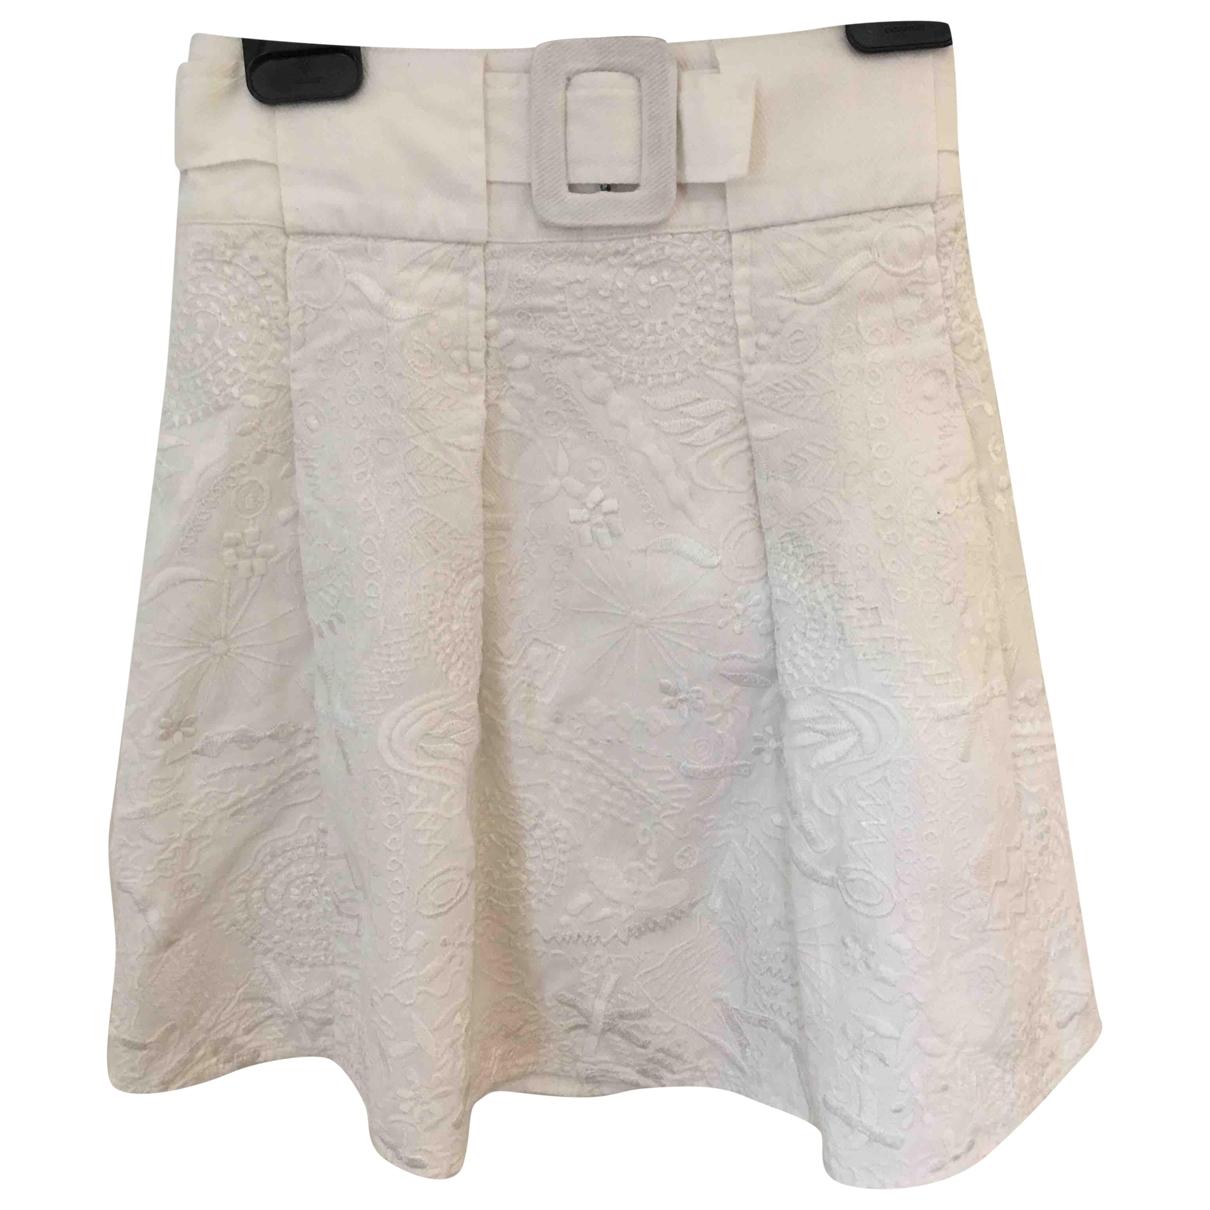 Essentiel Antwerp \N White Cotton skirt for Kids 6 years - up to 114cm FR